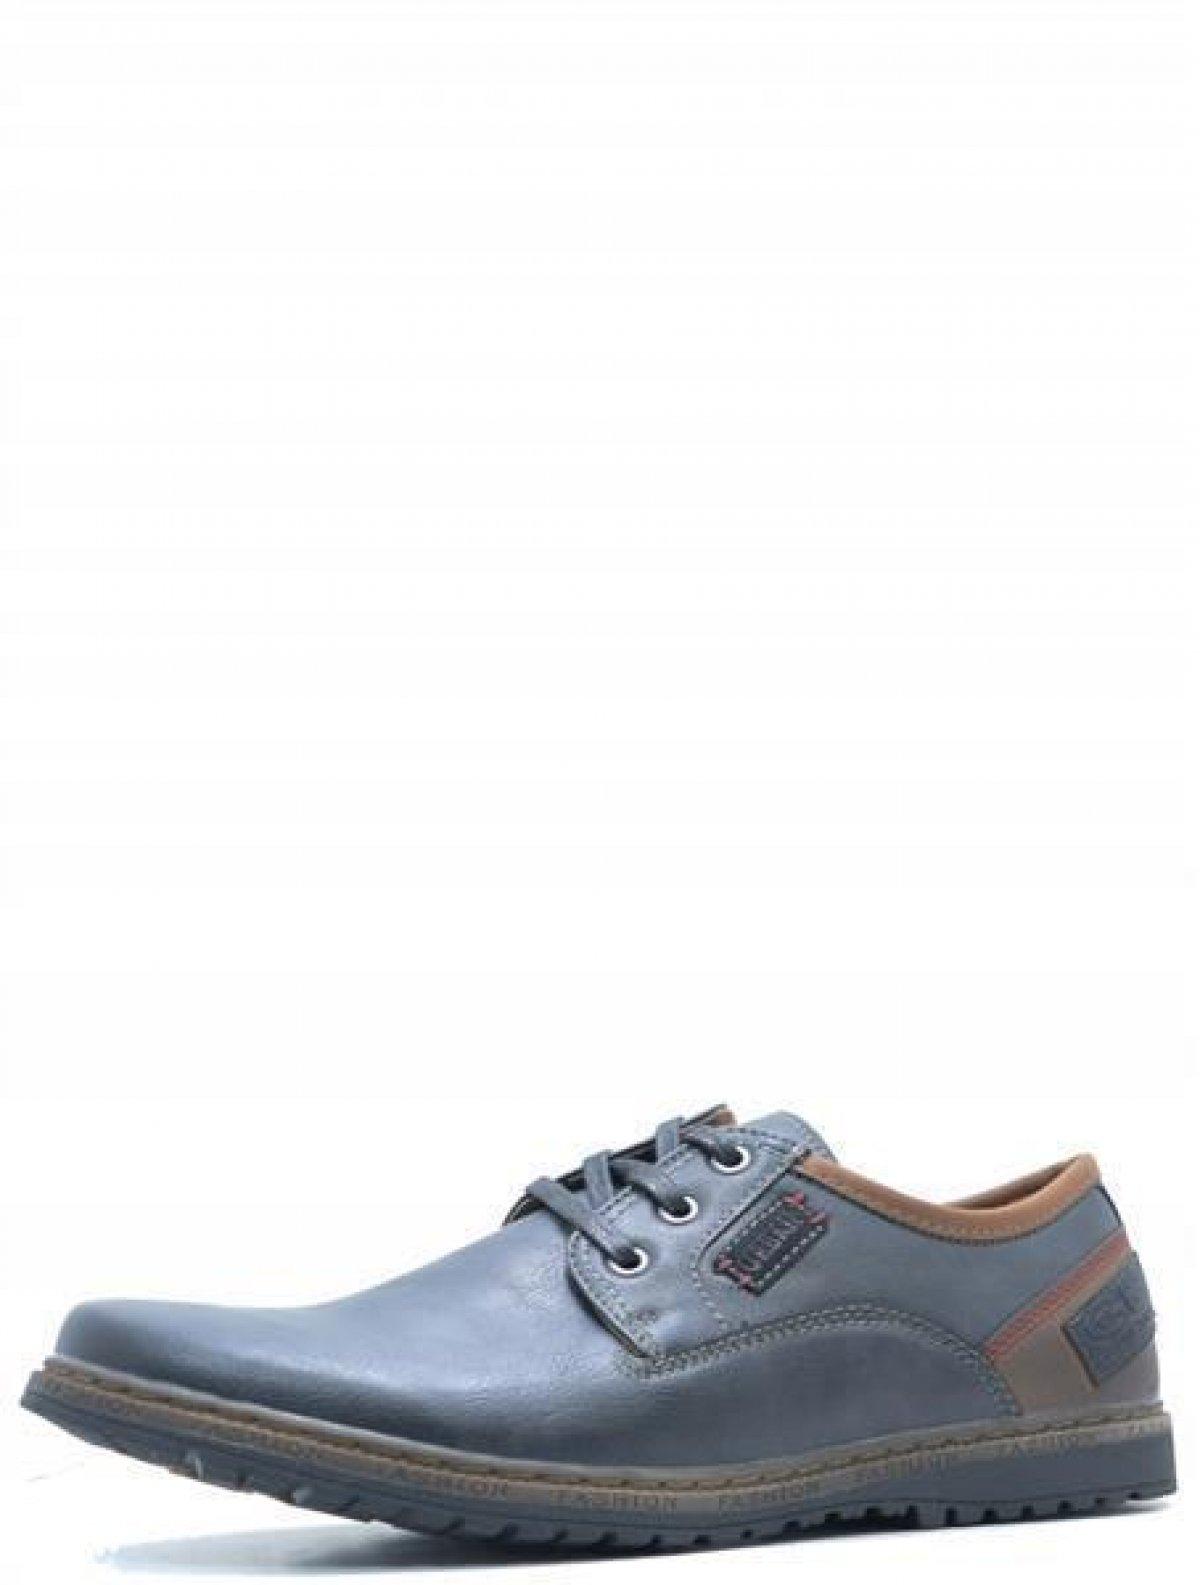 Carido S8169-10 мужские туфли